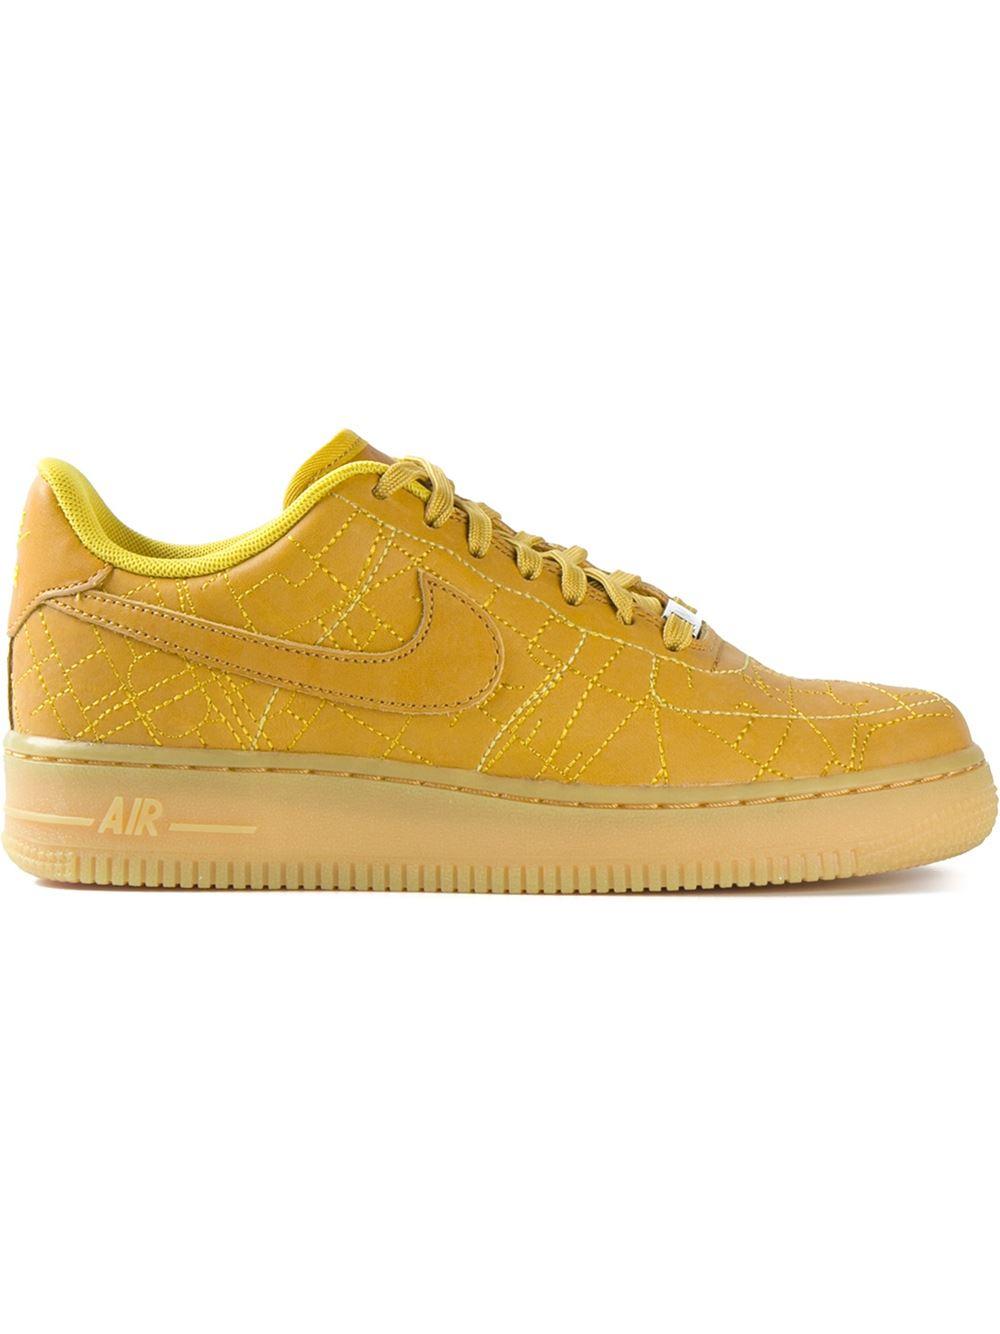 nike air force yellow